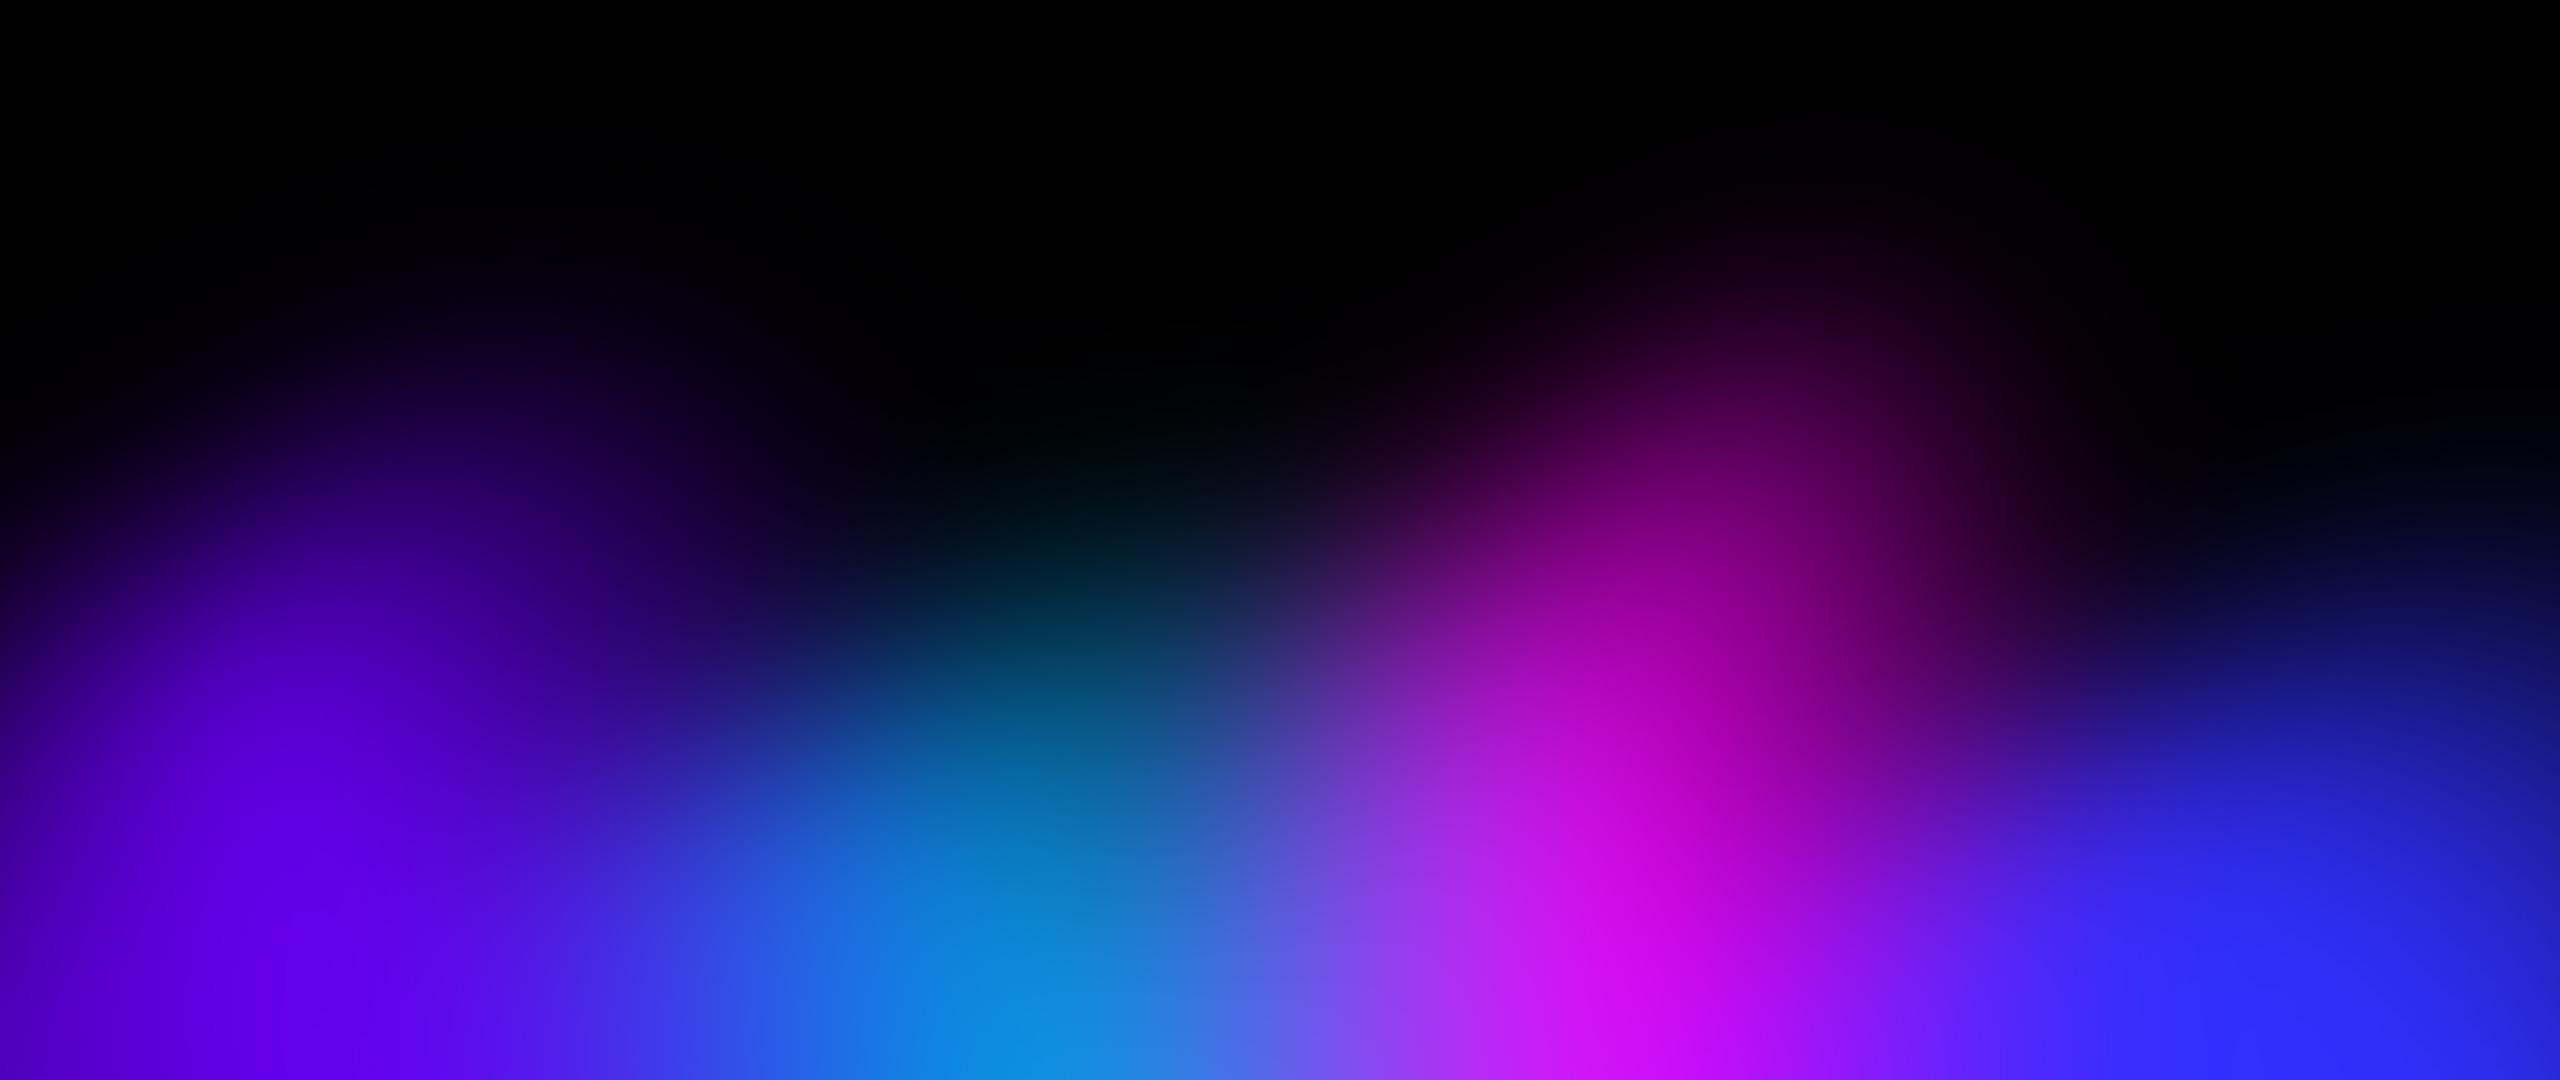 gradient-colorful-blur-minimalist-v6.jpg